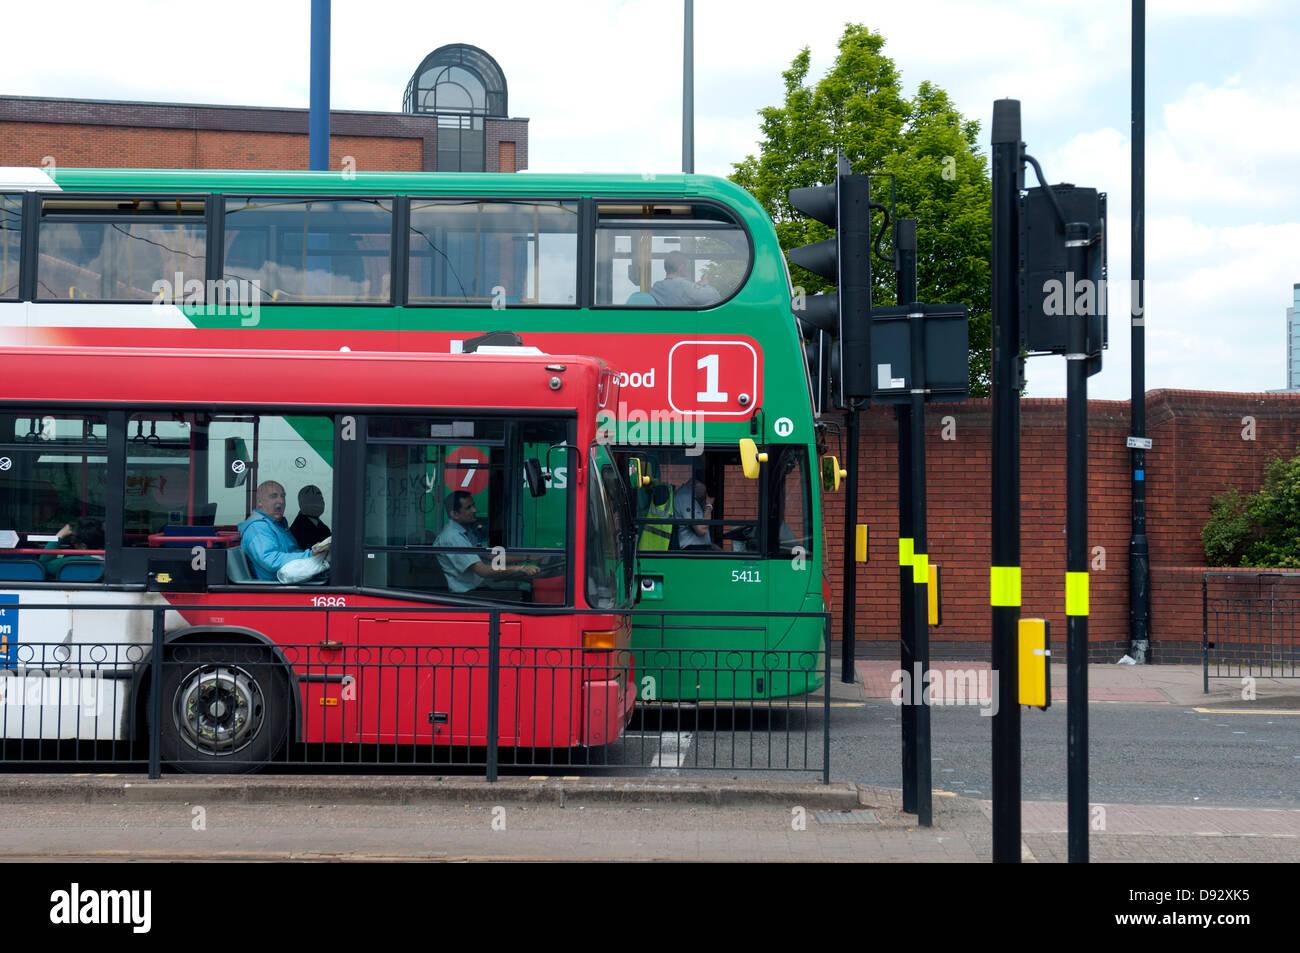 Buses stopped at traffic lights, Wolverhampton, West Midlands, England, UK - Stock Image